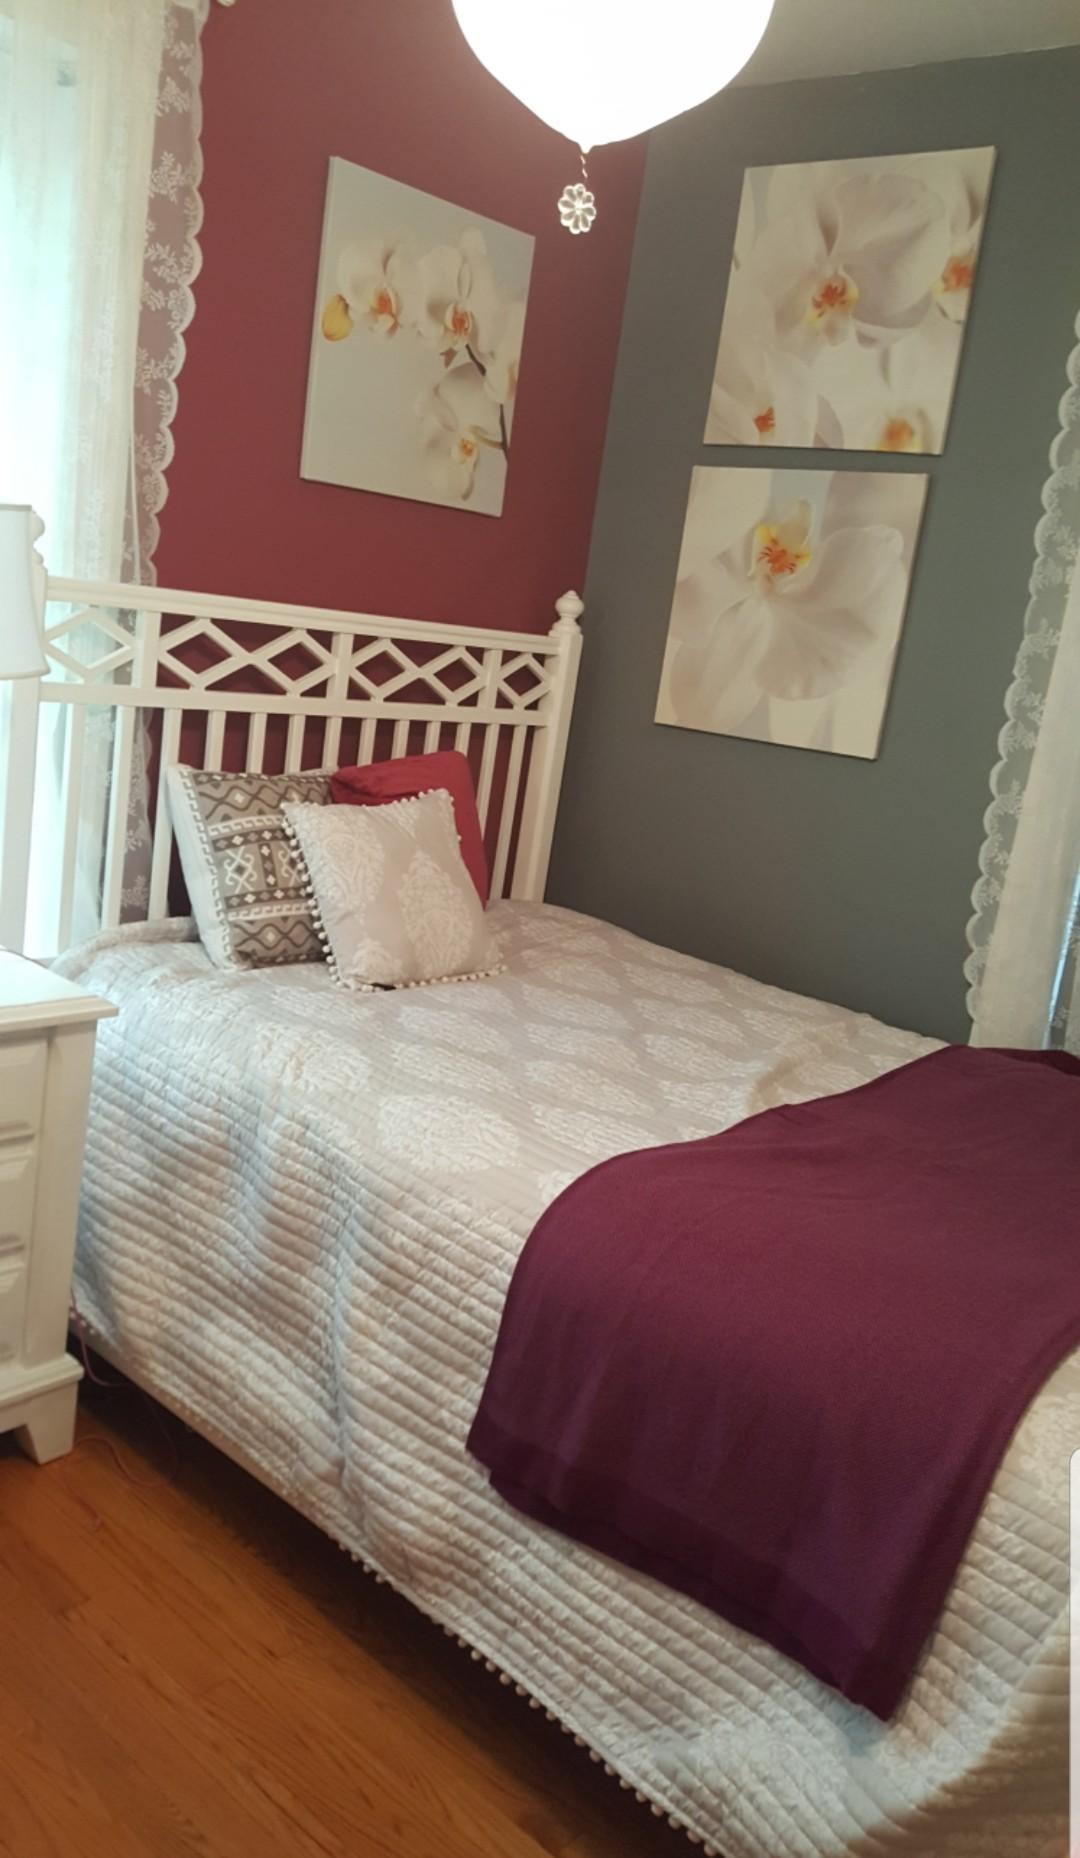 Bed & Breakfast w/ 5 Nights Dinner Private Room in Boston, MA (Lillian B)